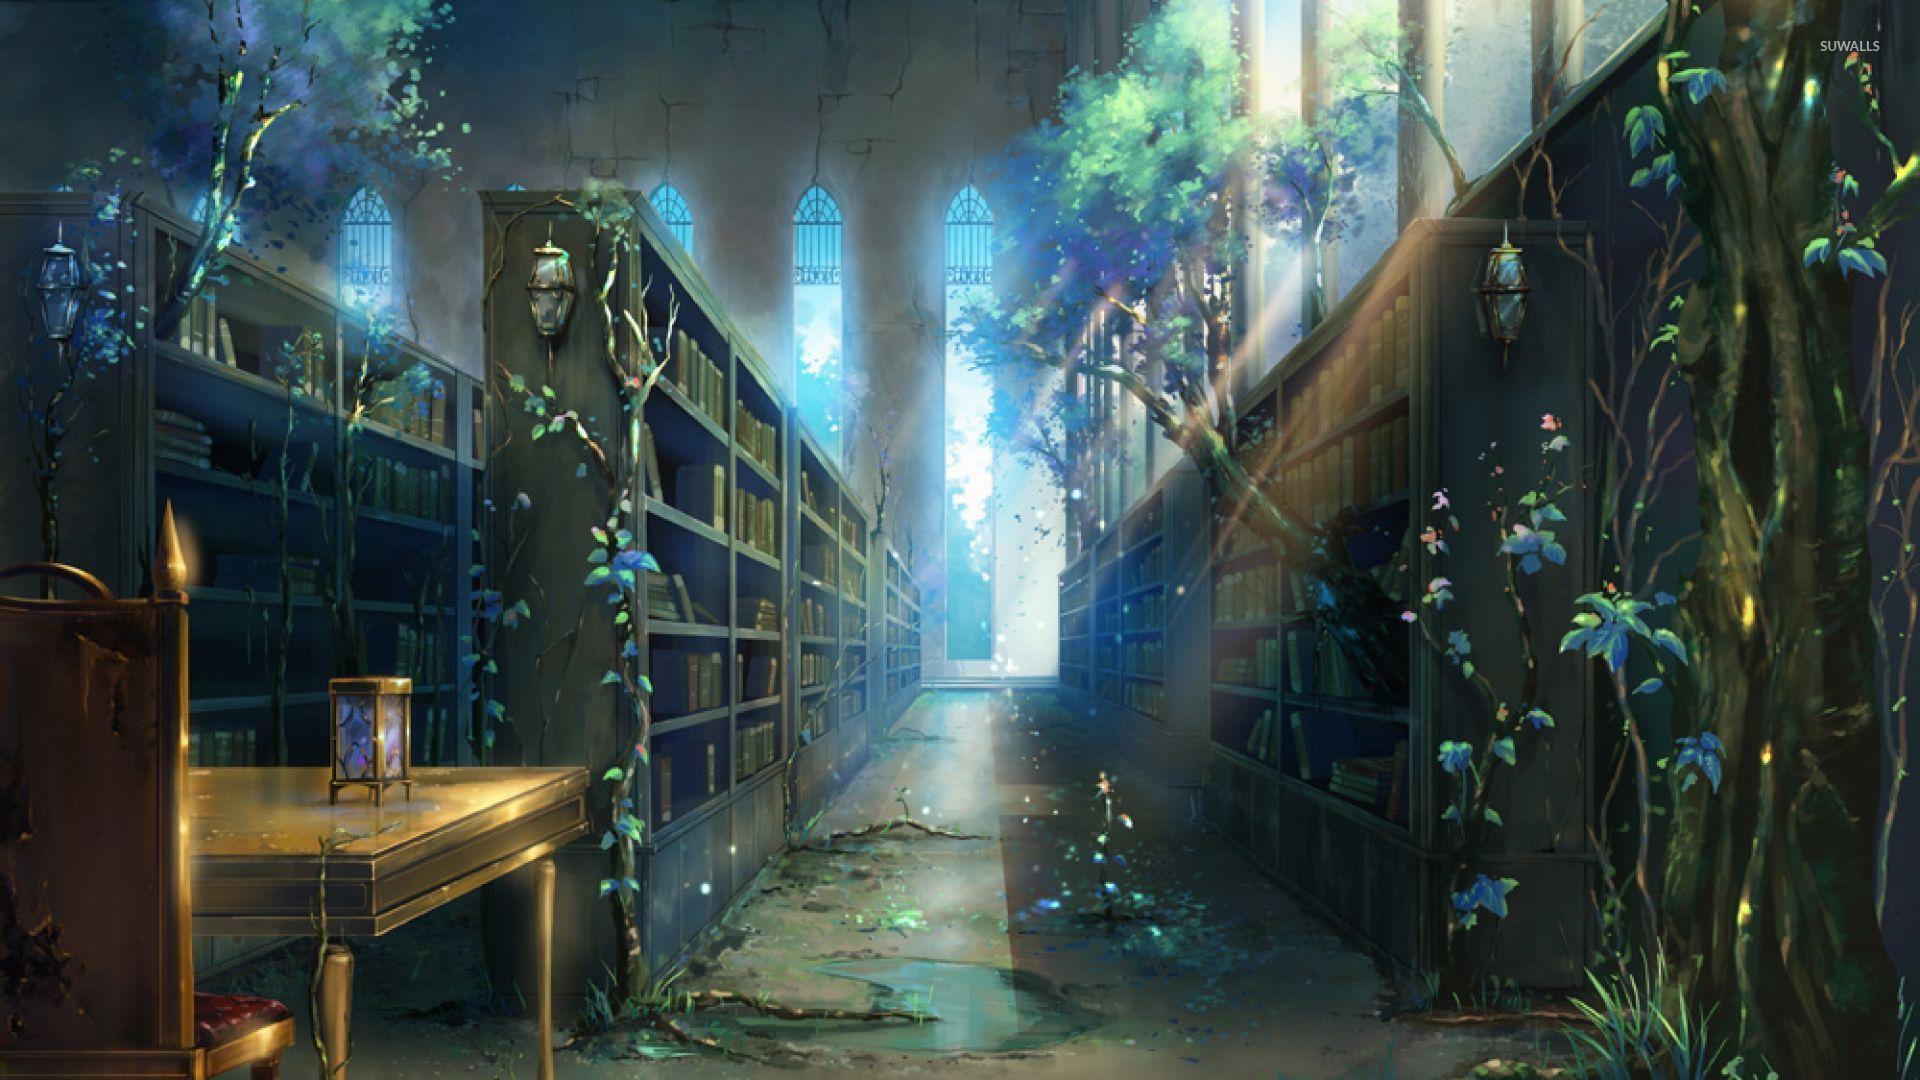 abandoned fantasy library wallpaper 67428